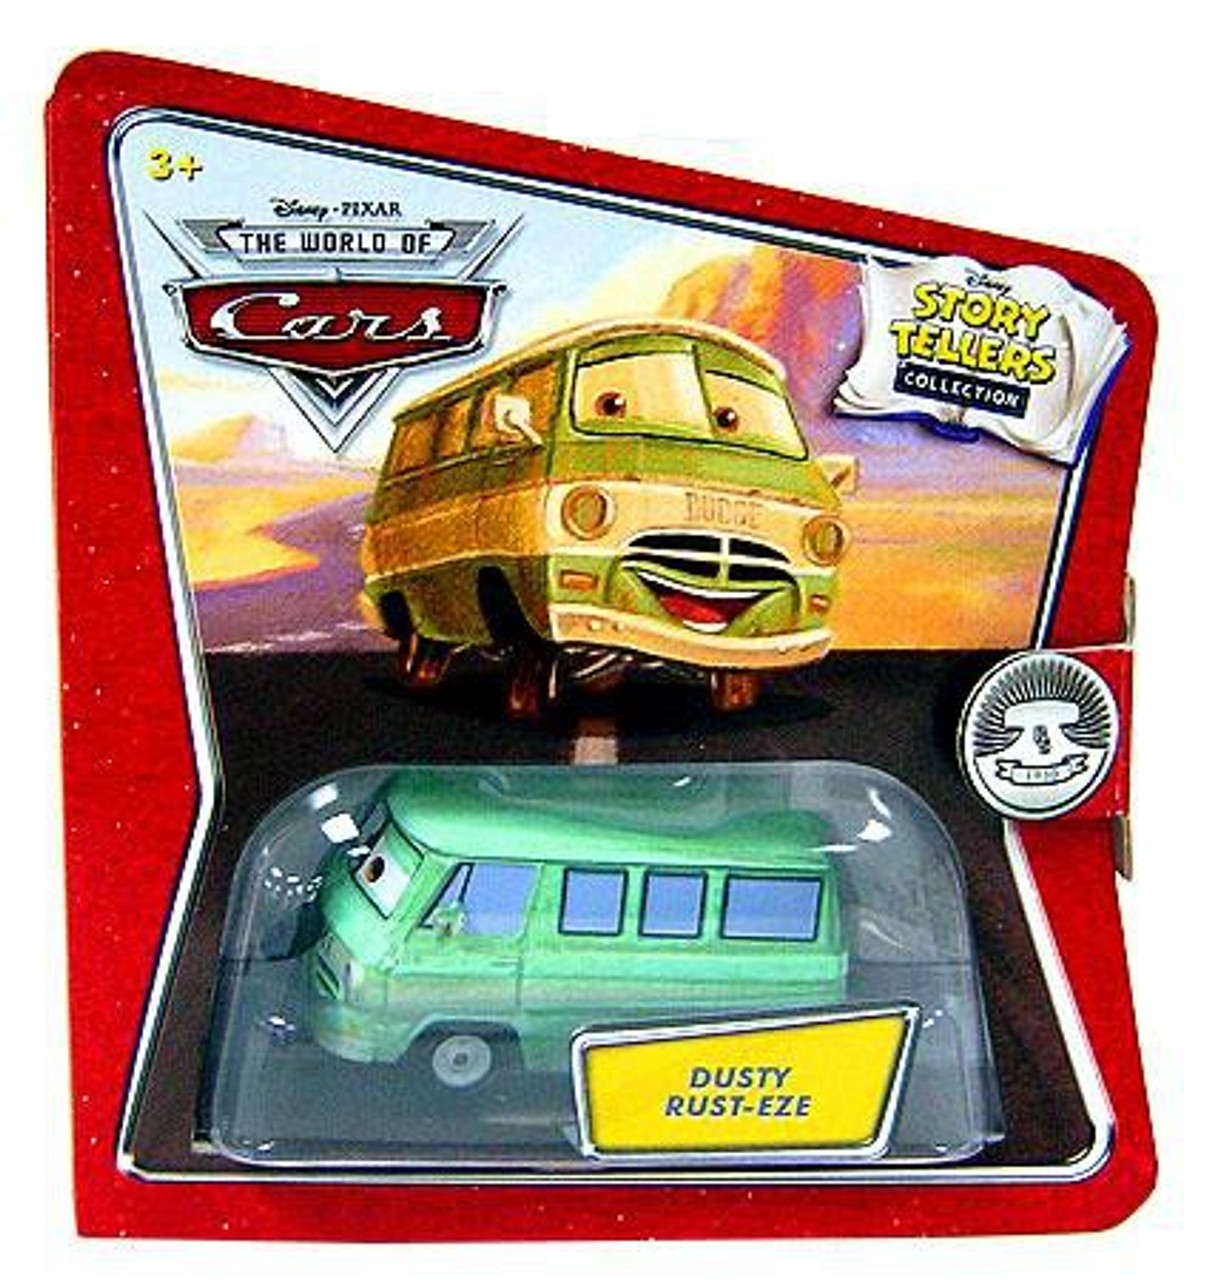 Disney Cars The World of Cars Story Tellers Dusty Rust-Eze Diecast Car